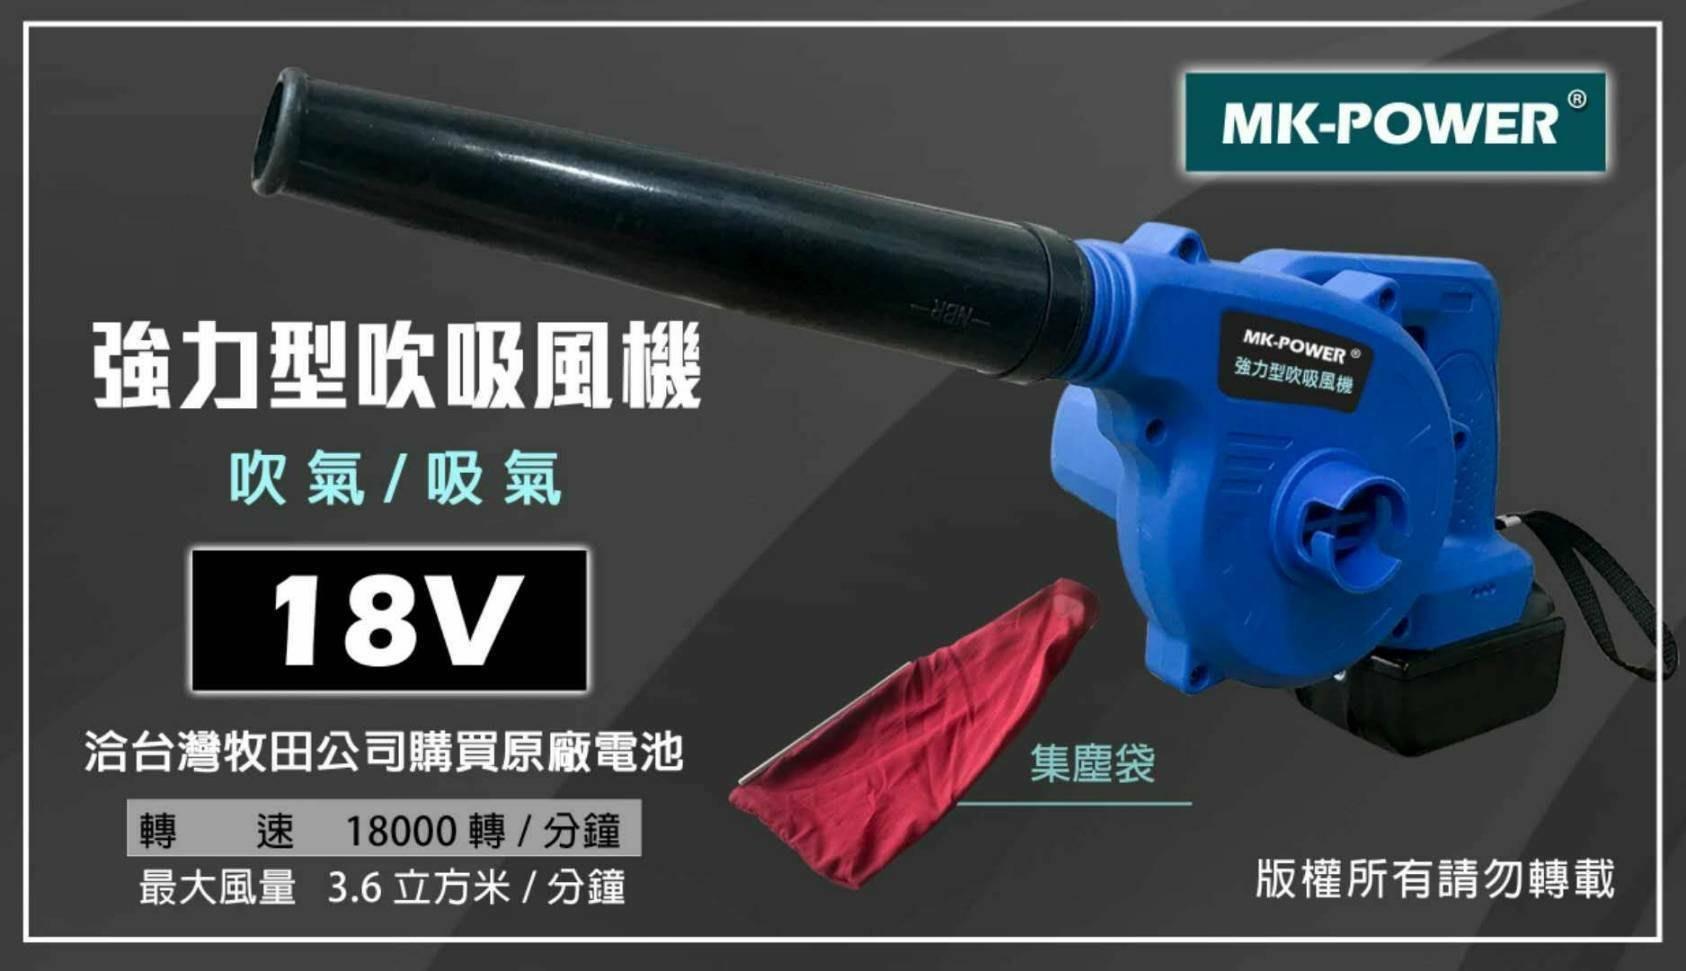 WIN五金 MK-POWER 單主機 18V 強力型充電式鋰電鼓風機 吹葉機 吹風機  吹吸兩用型 吹吸風機